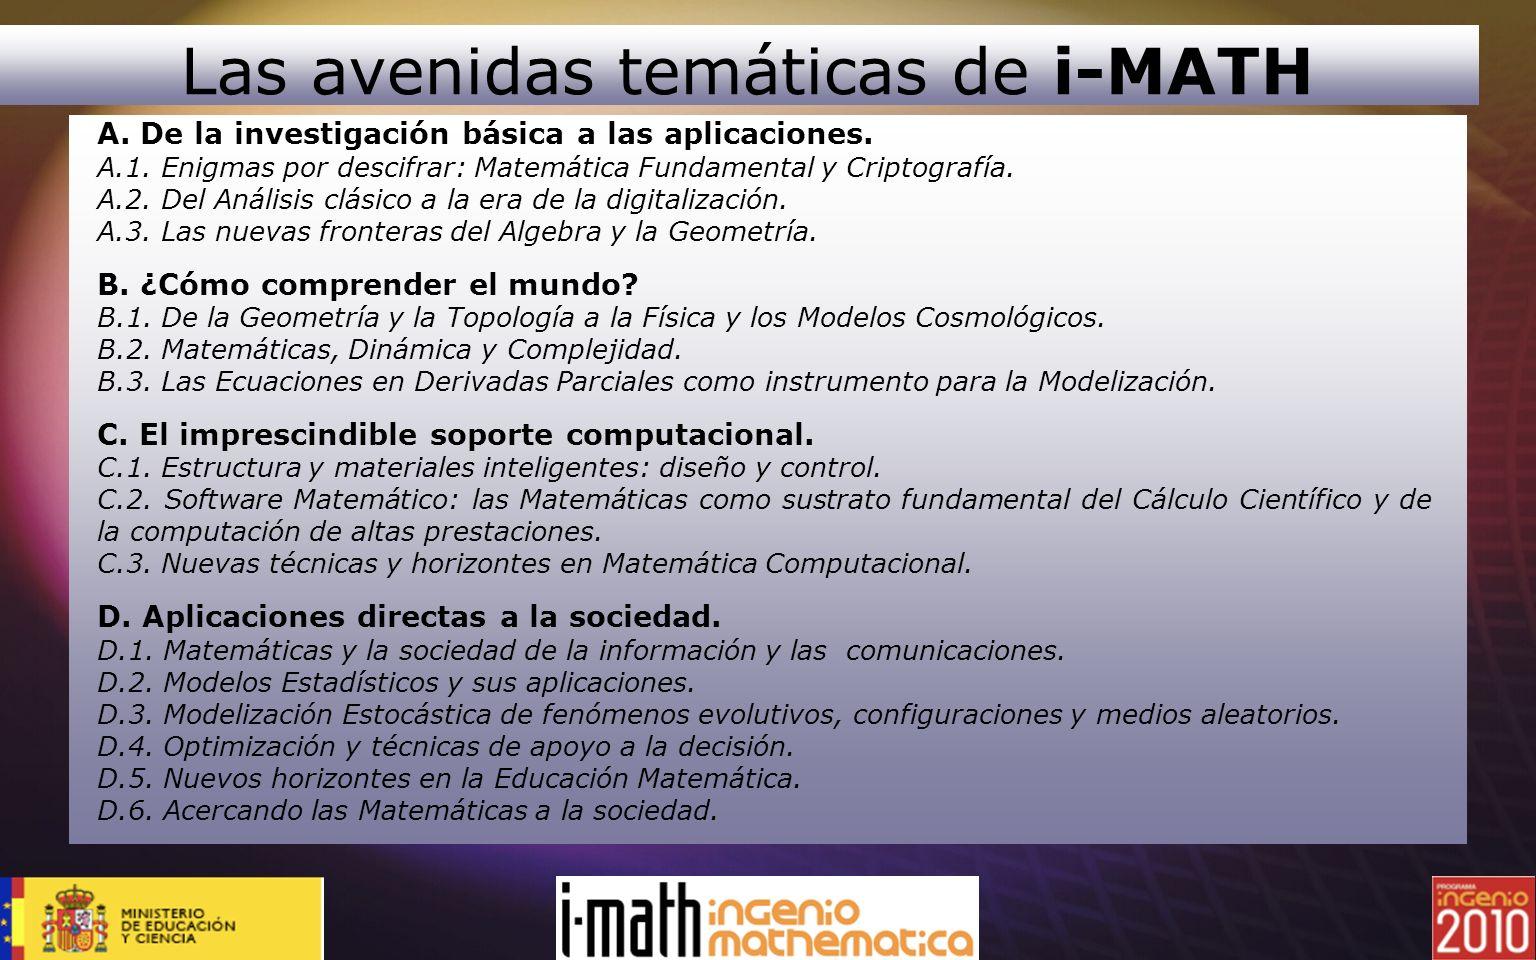 Las avenidas temáticas de i-MATH